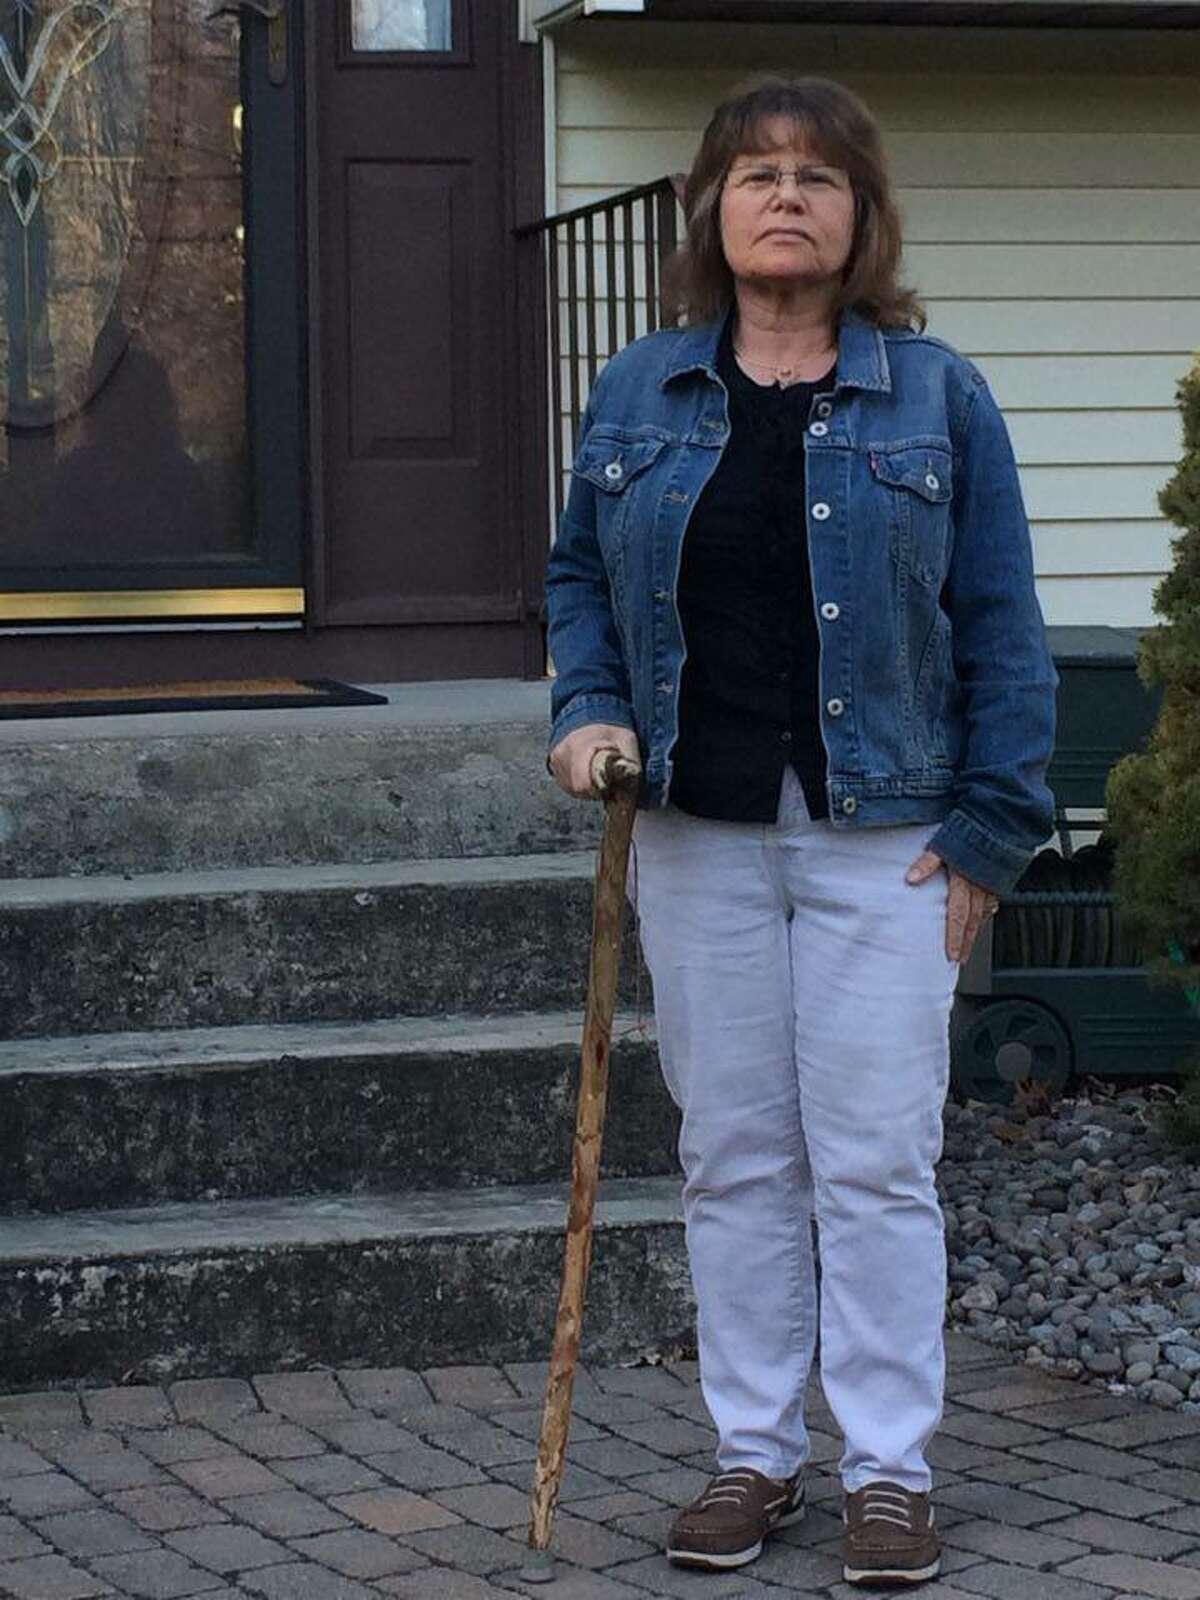 Debra Hall, outside of her home. (Photo courtesy Debra Hall)